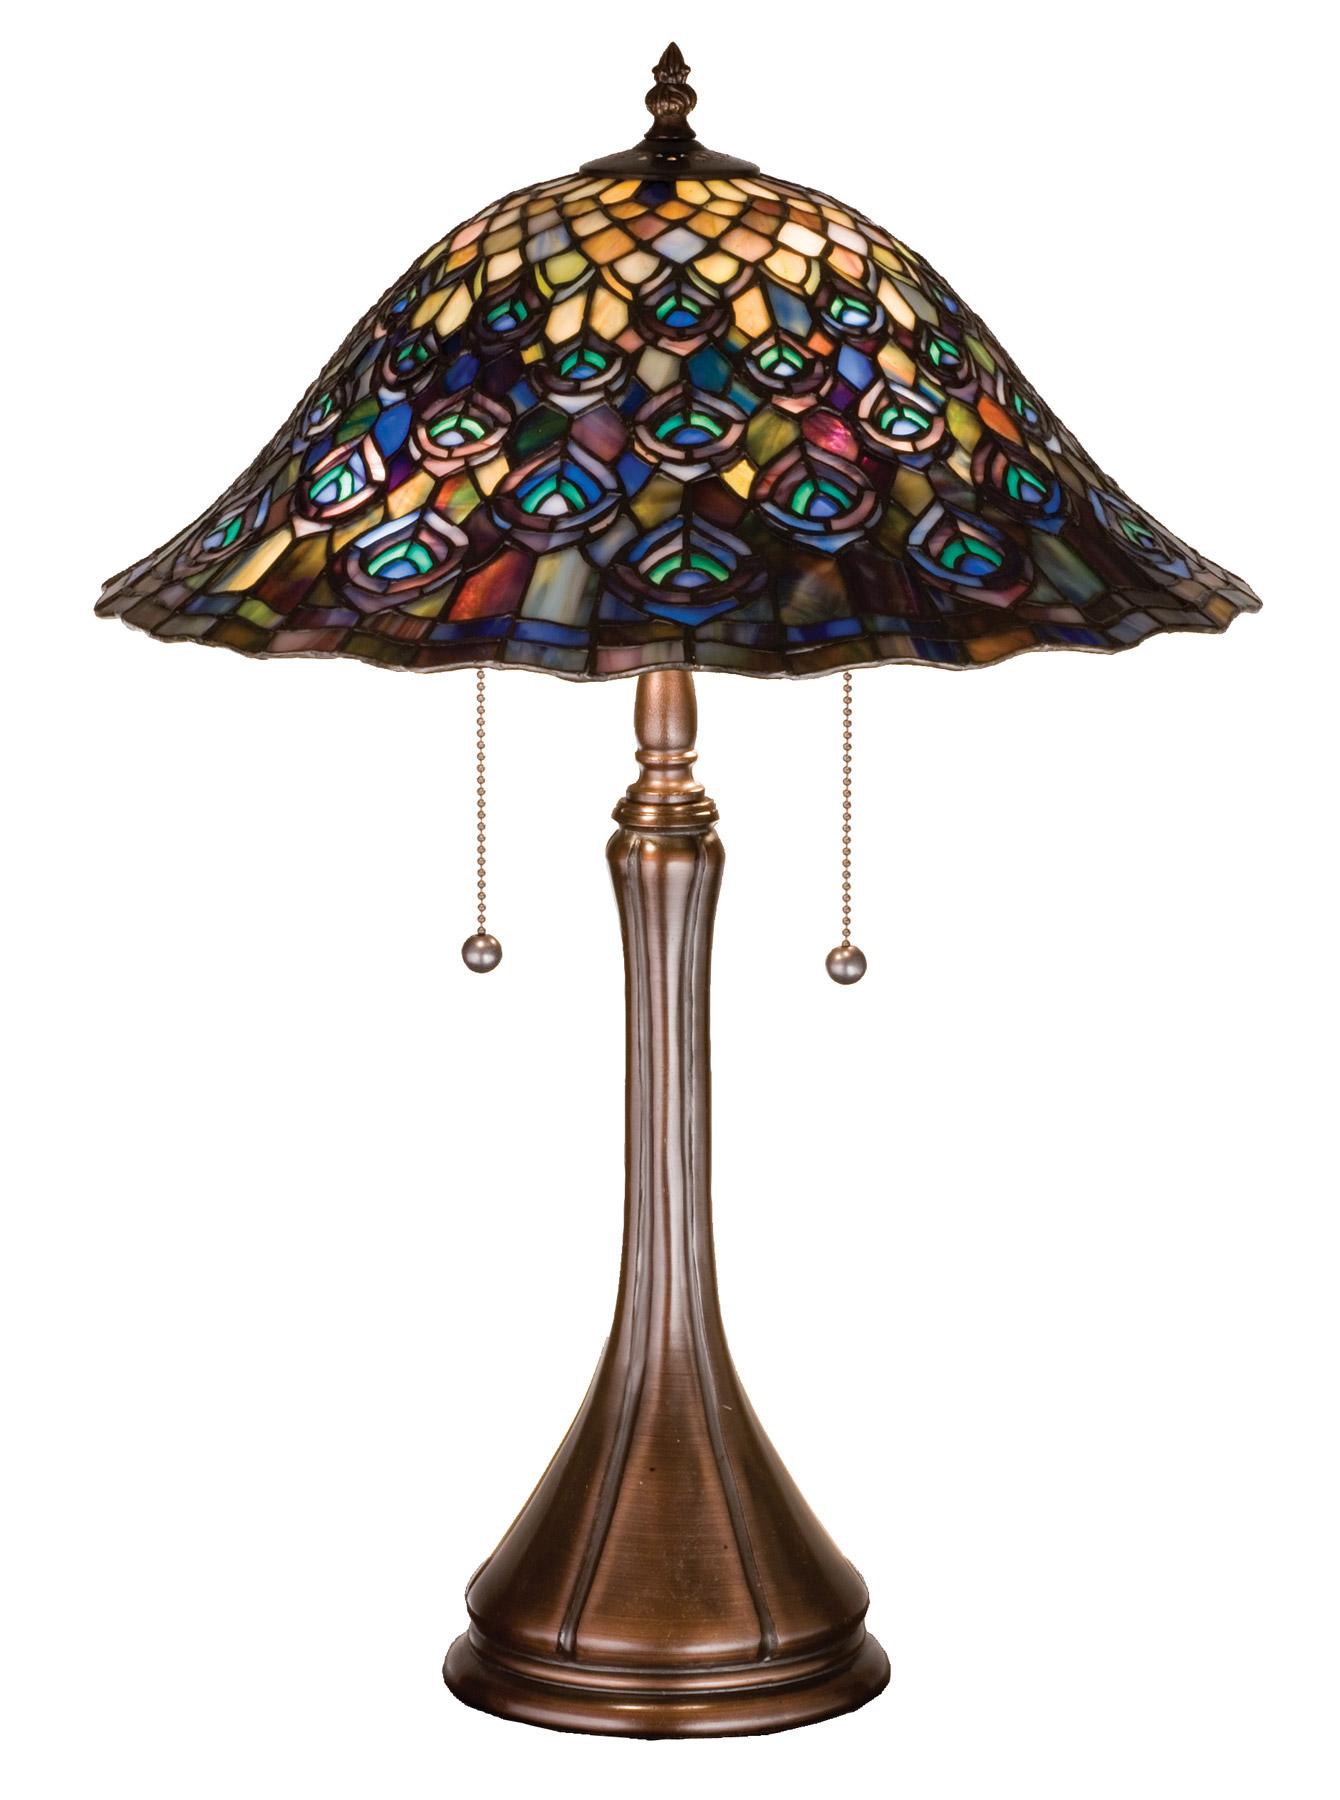 Own a peacock tiffany lamp for a beautiful home decor warisan lighting geometric peacock tiffany lamps arubaitofo Gallery